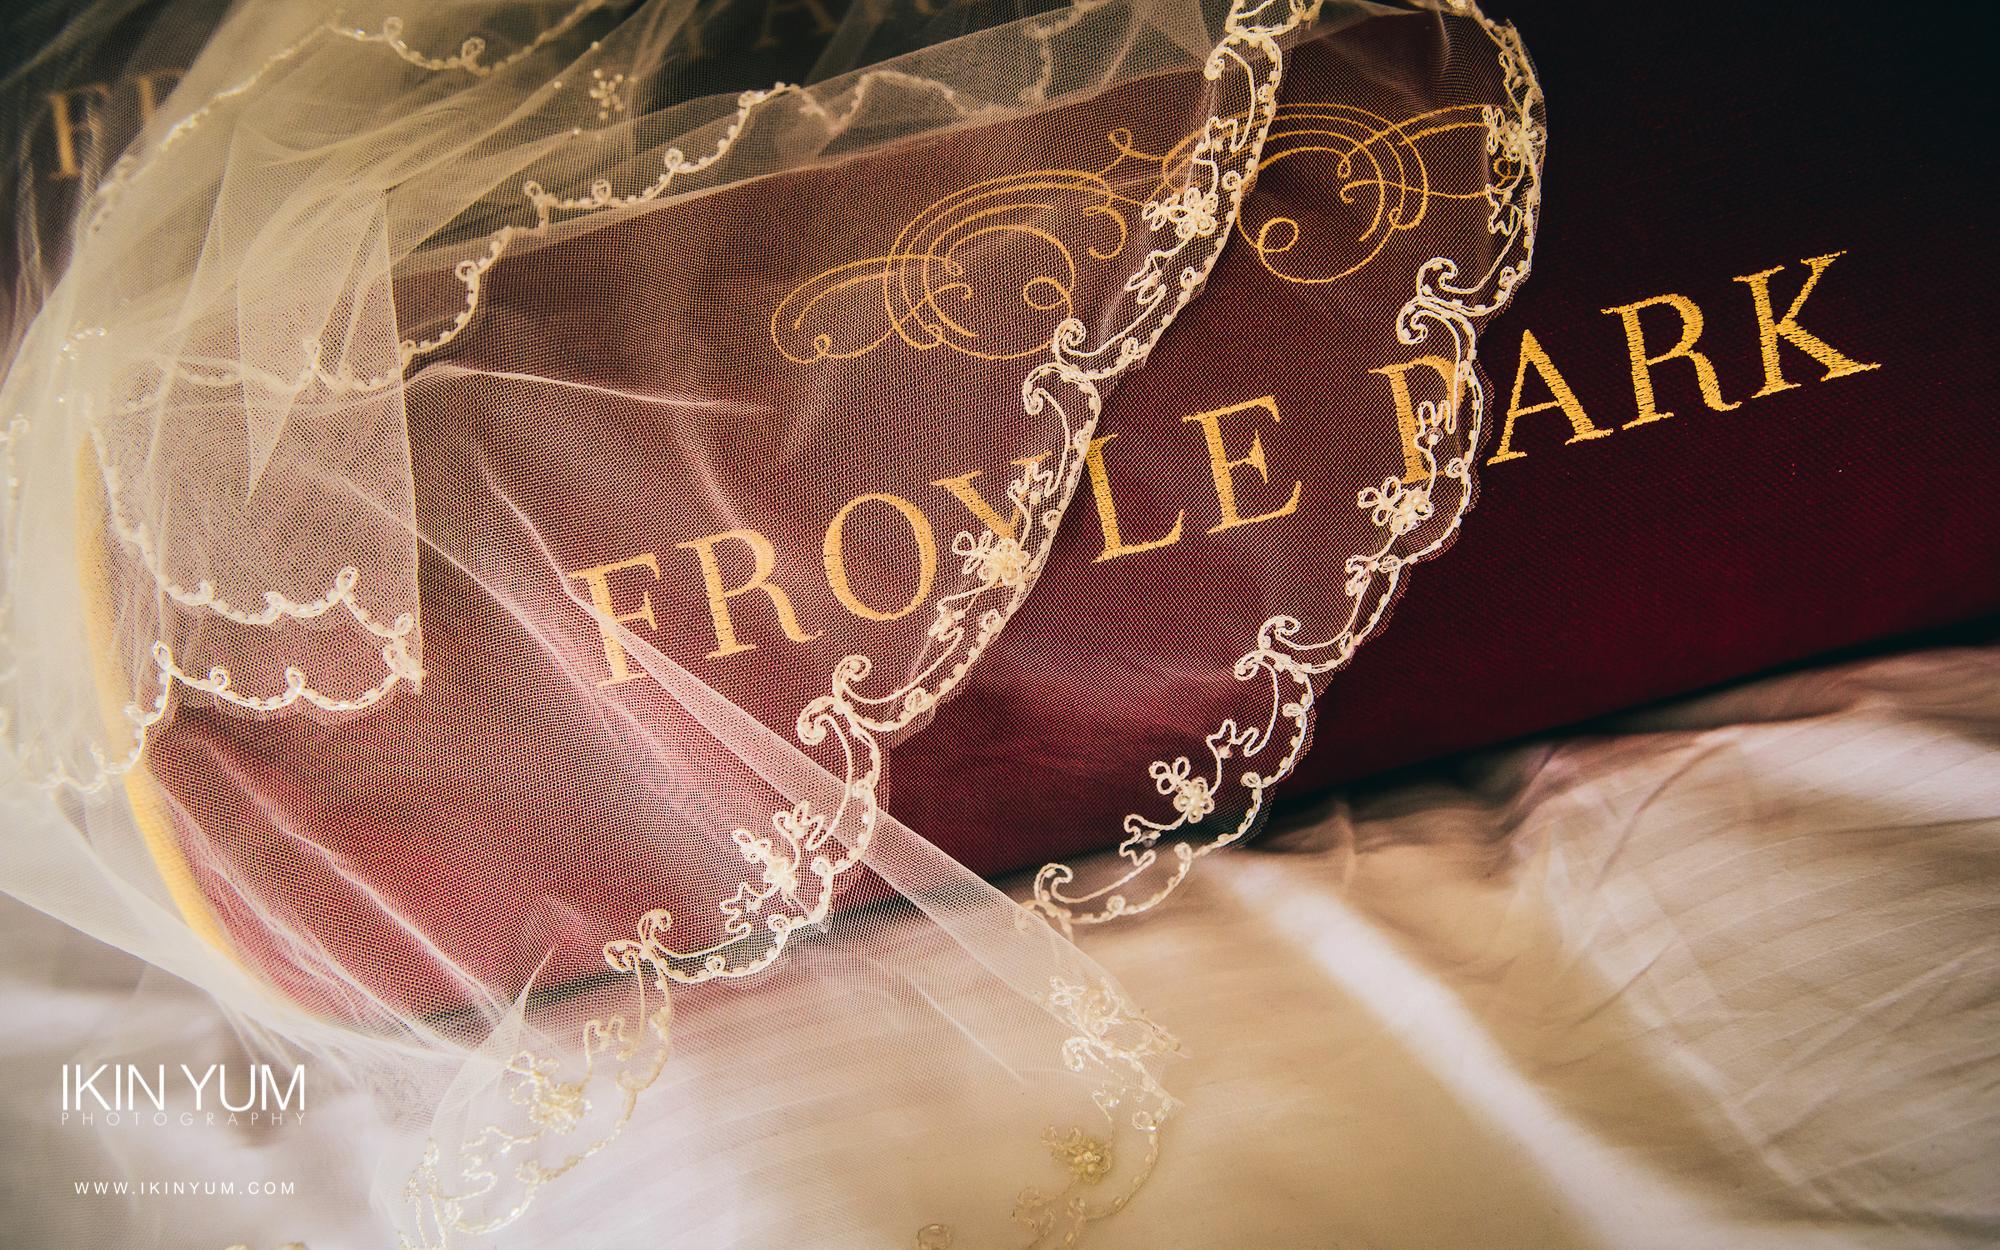 Froyle Park Indian Wedding - Ikin Yum Photography-005.jpg